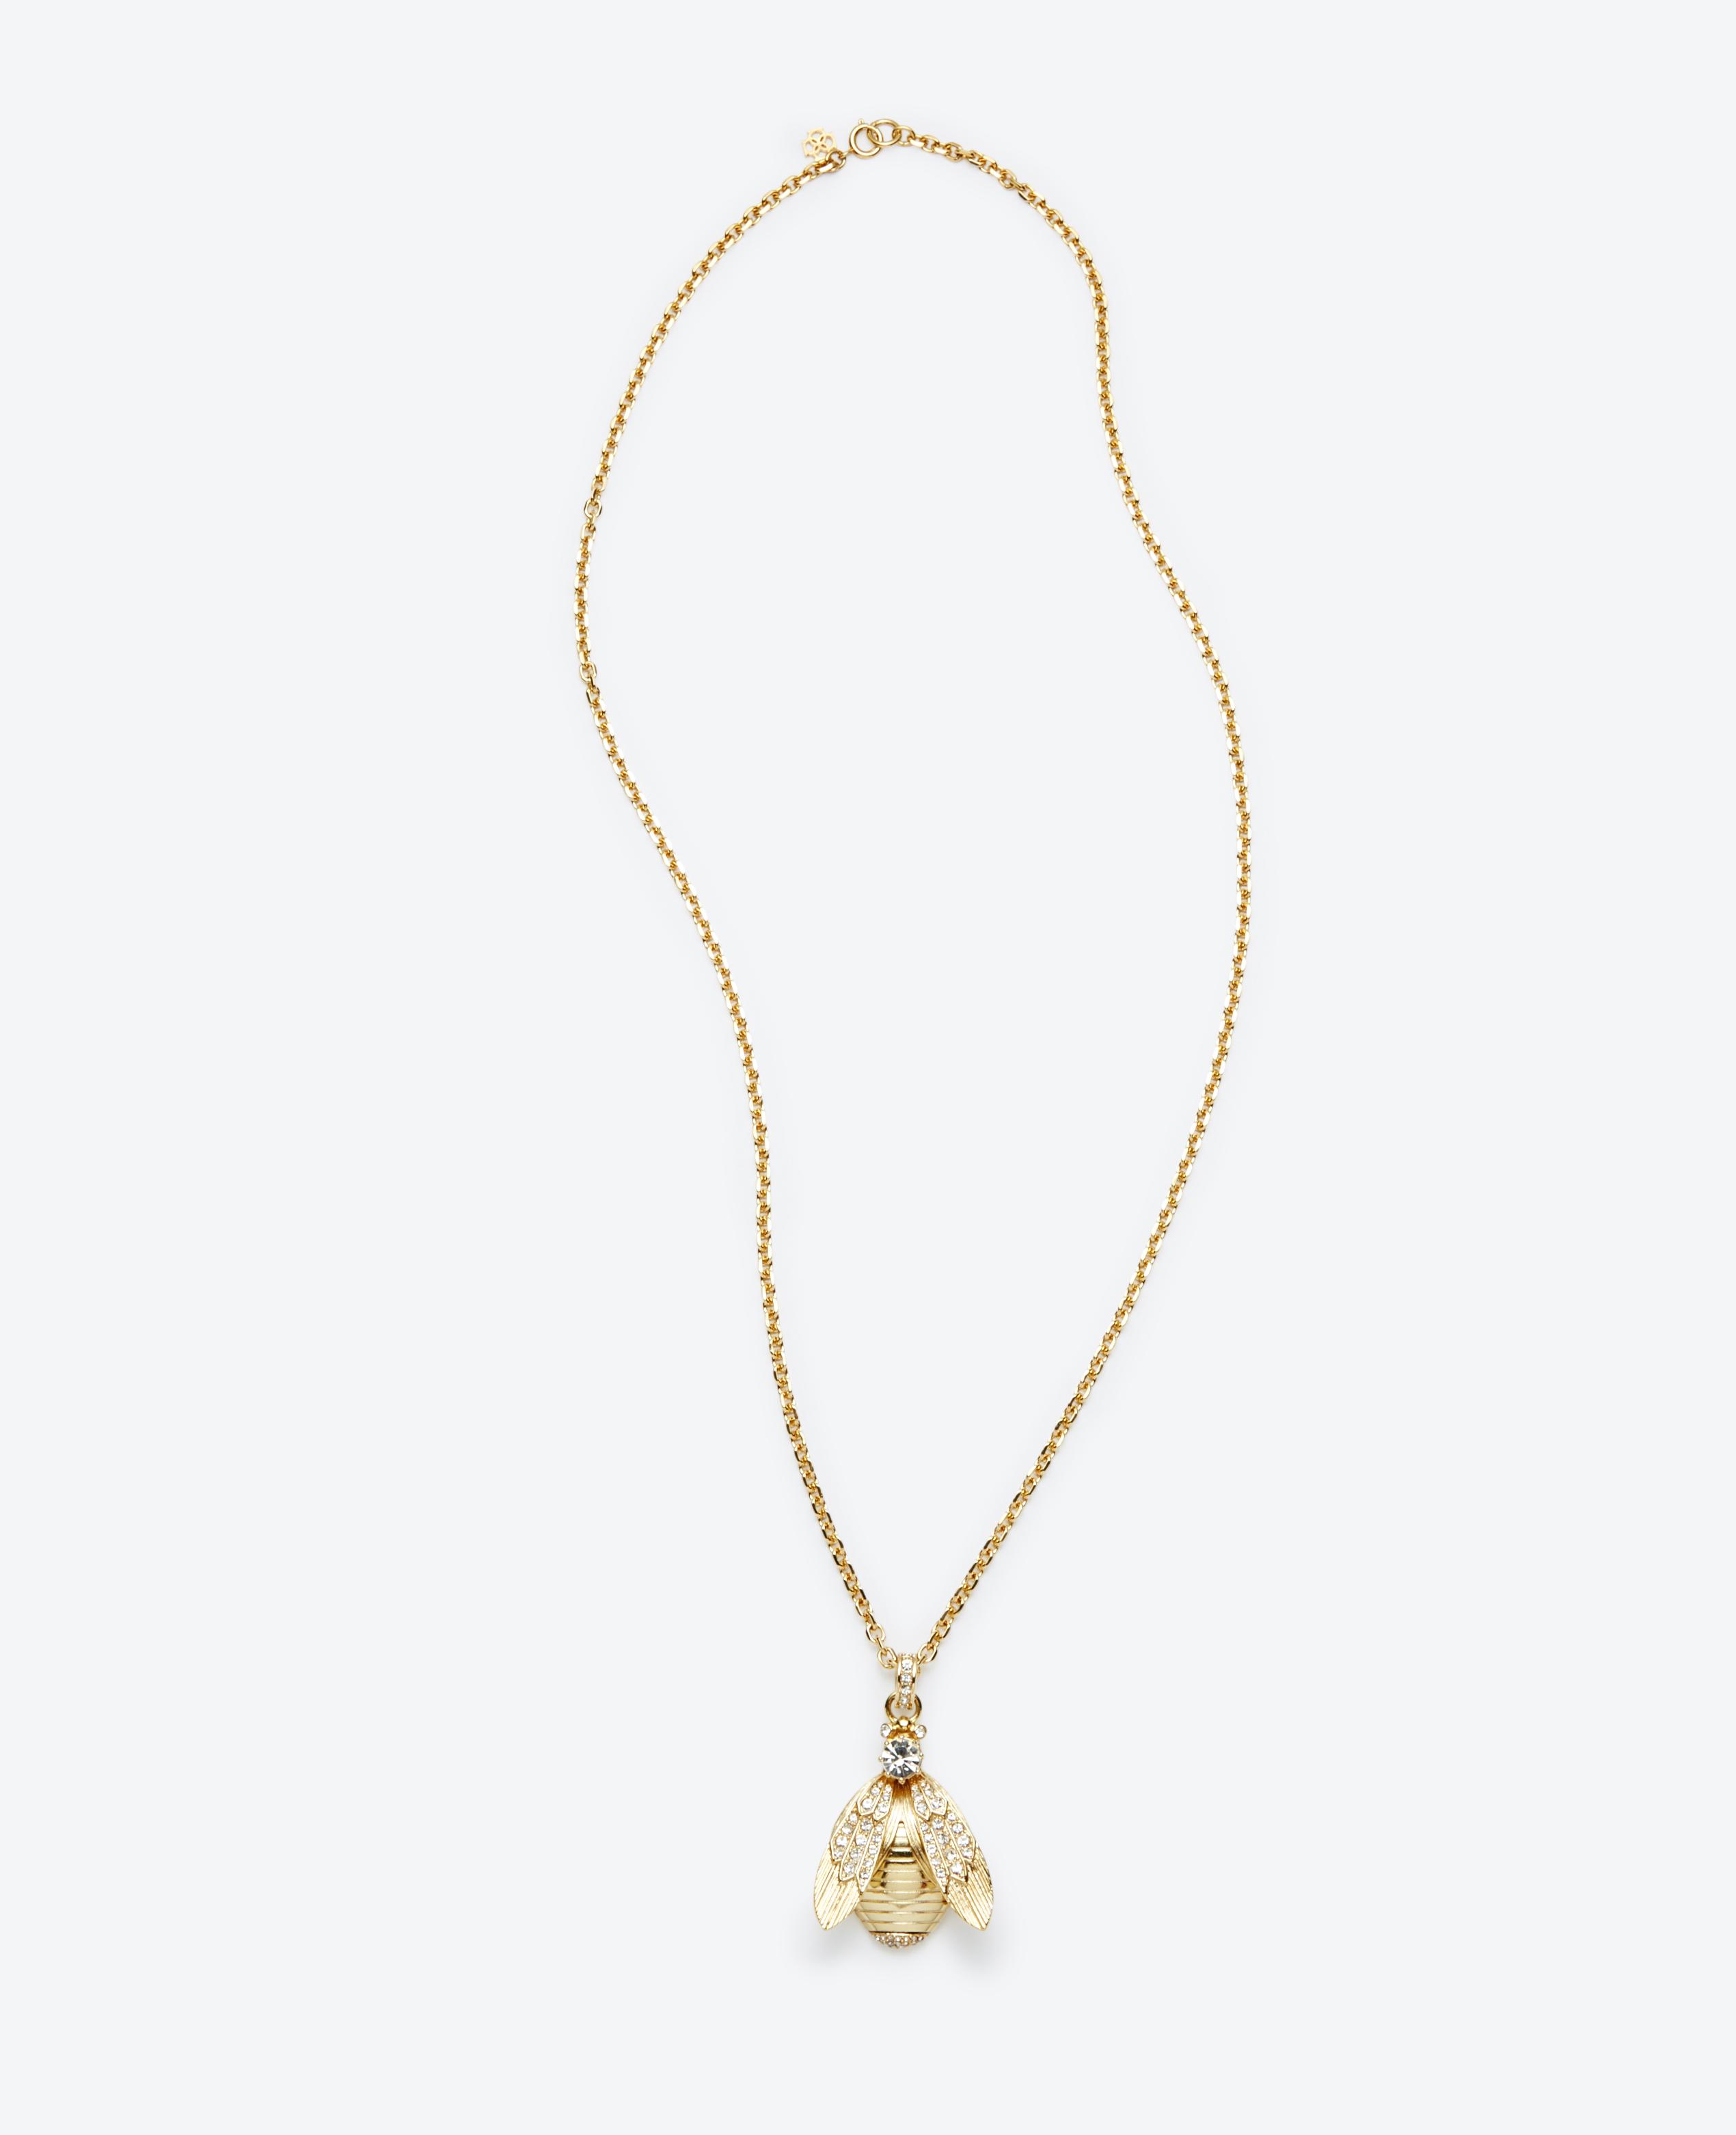 ANN TAYLOR Resin Metal Stud Necklace 9SRHeDGC0Q